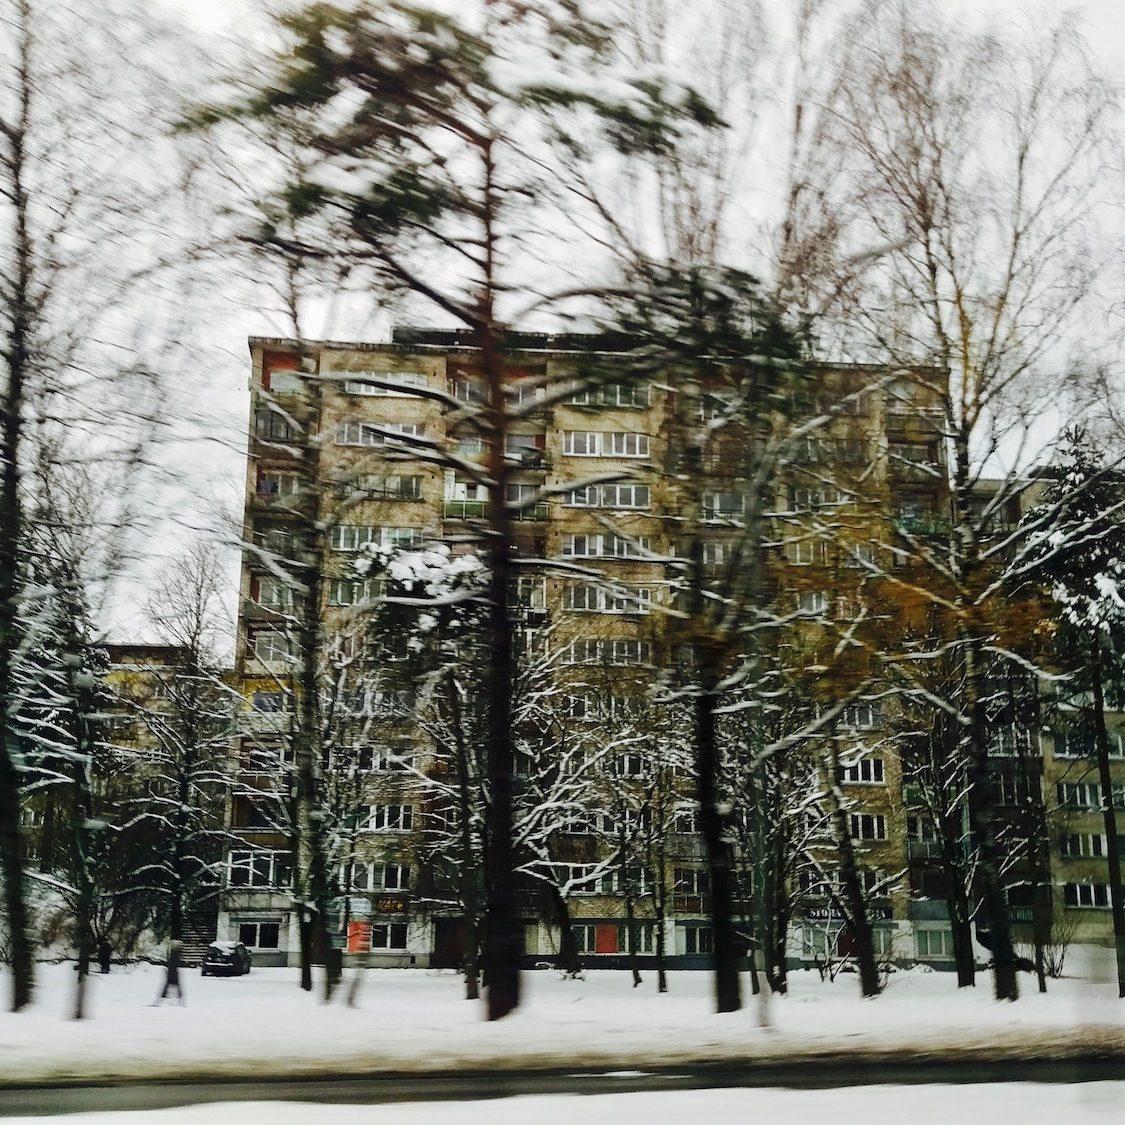 Border of Mezaparks neighborhood - Winter